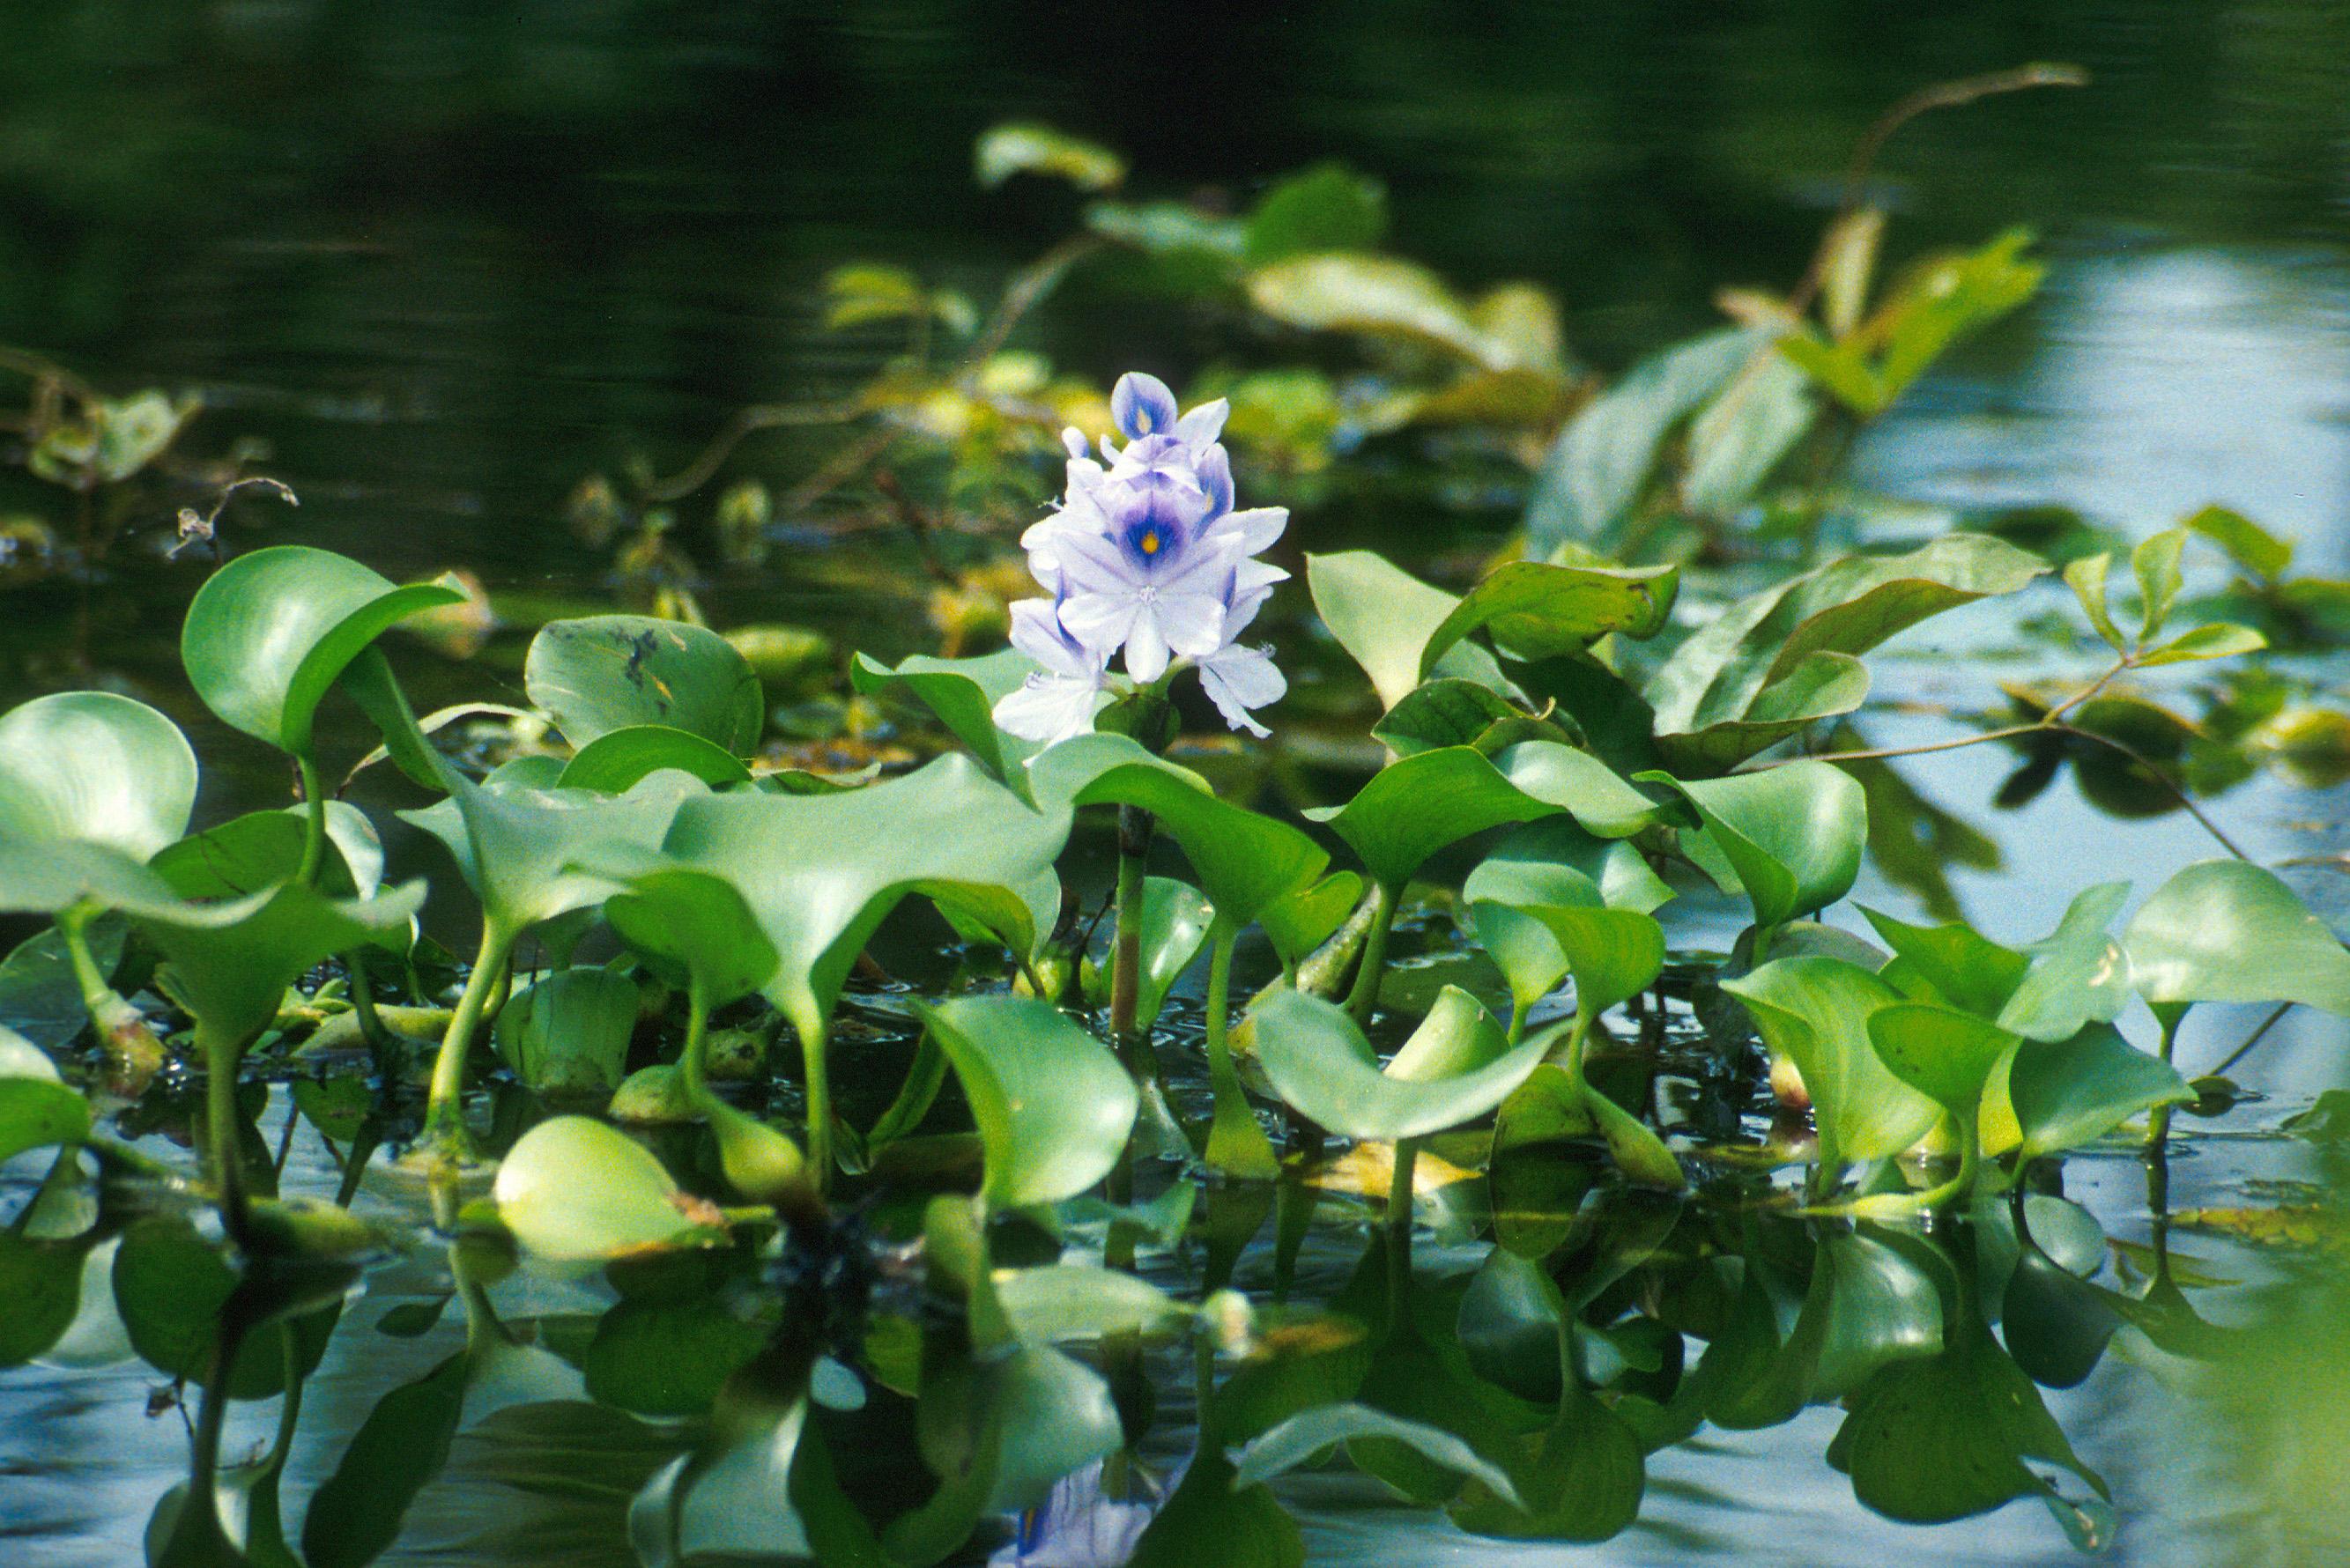 File:Water hyacinth.jpg - Wikimedia Commons